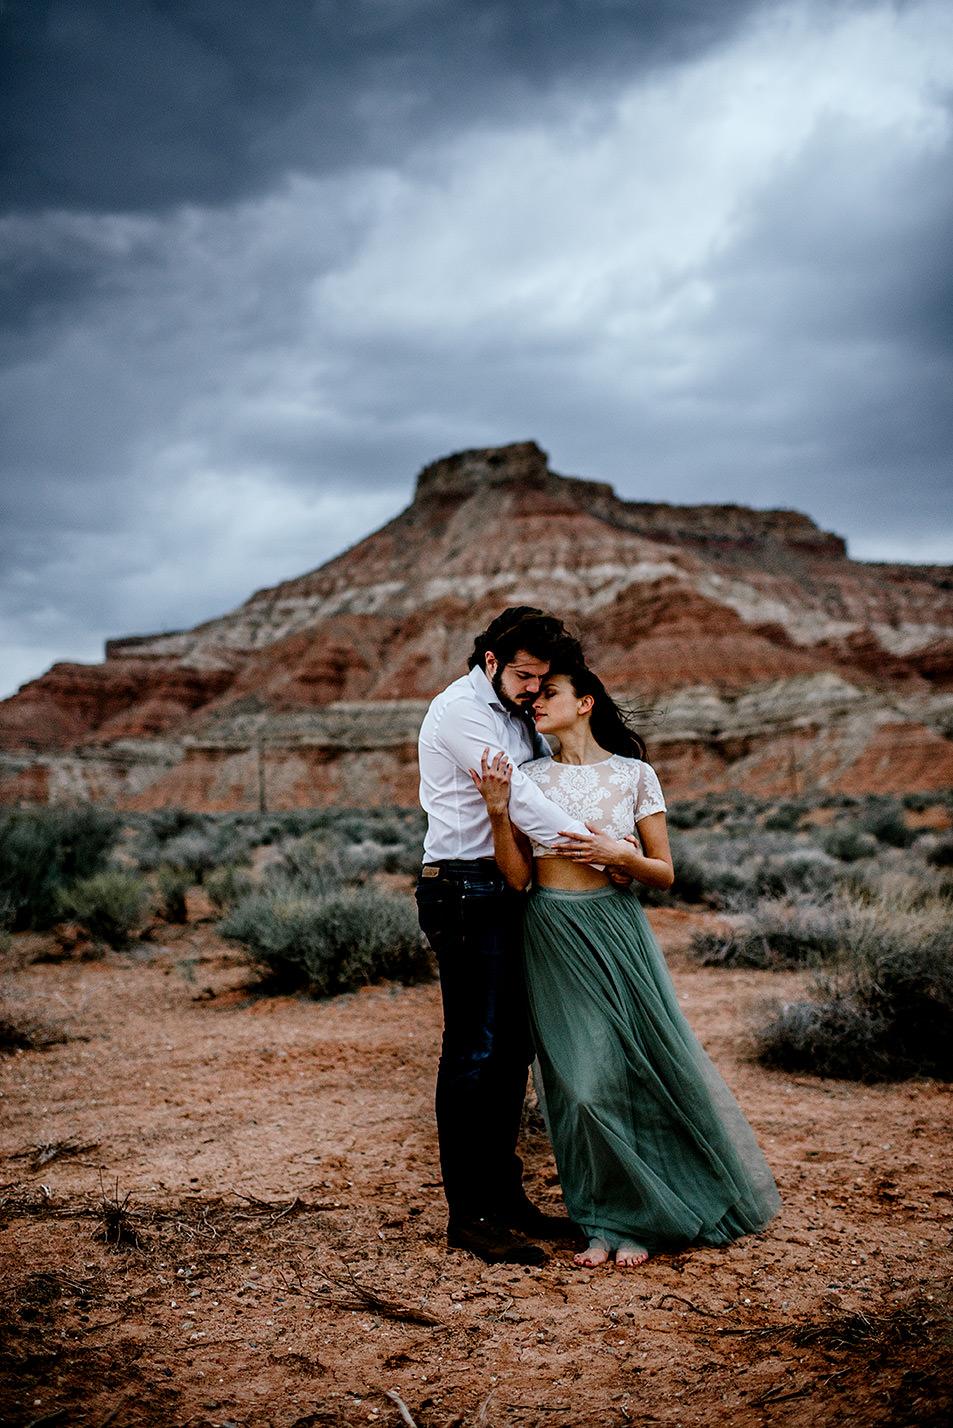 Zion_National_Park_Arizona_Wedding_Photographer_036.jpg